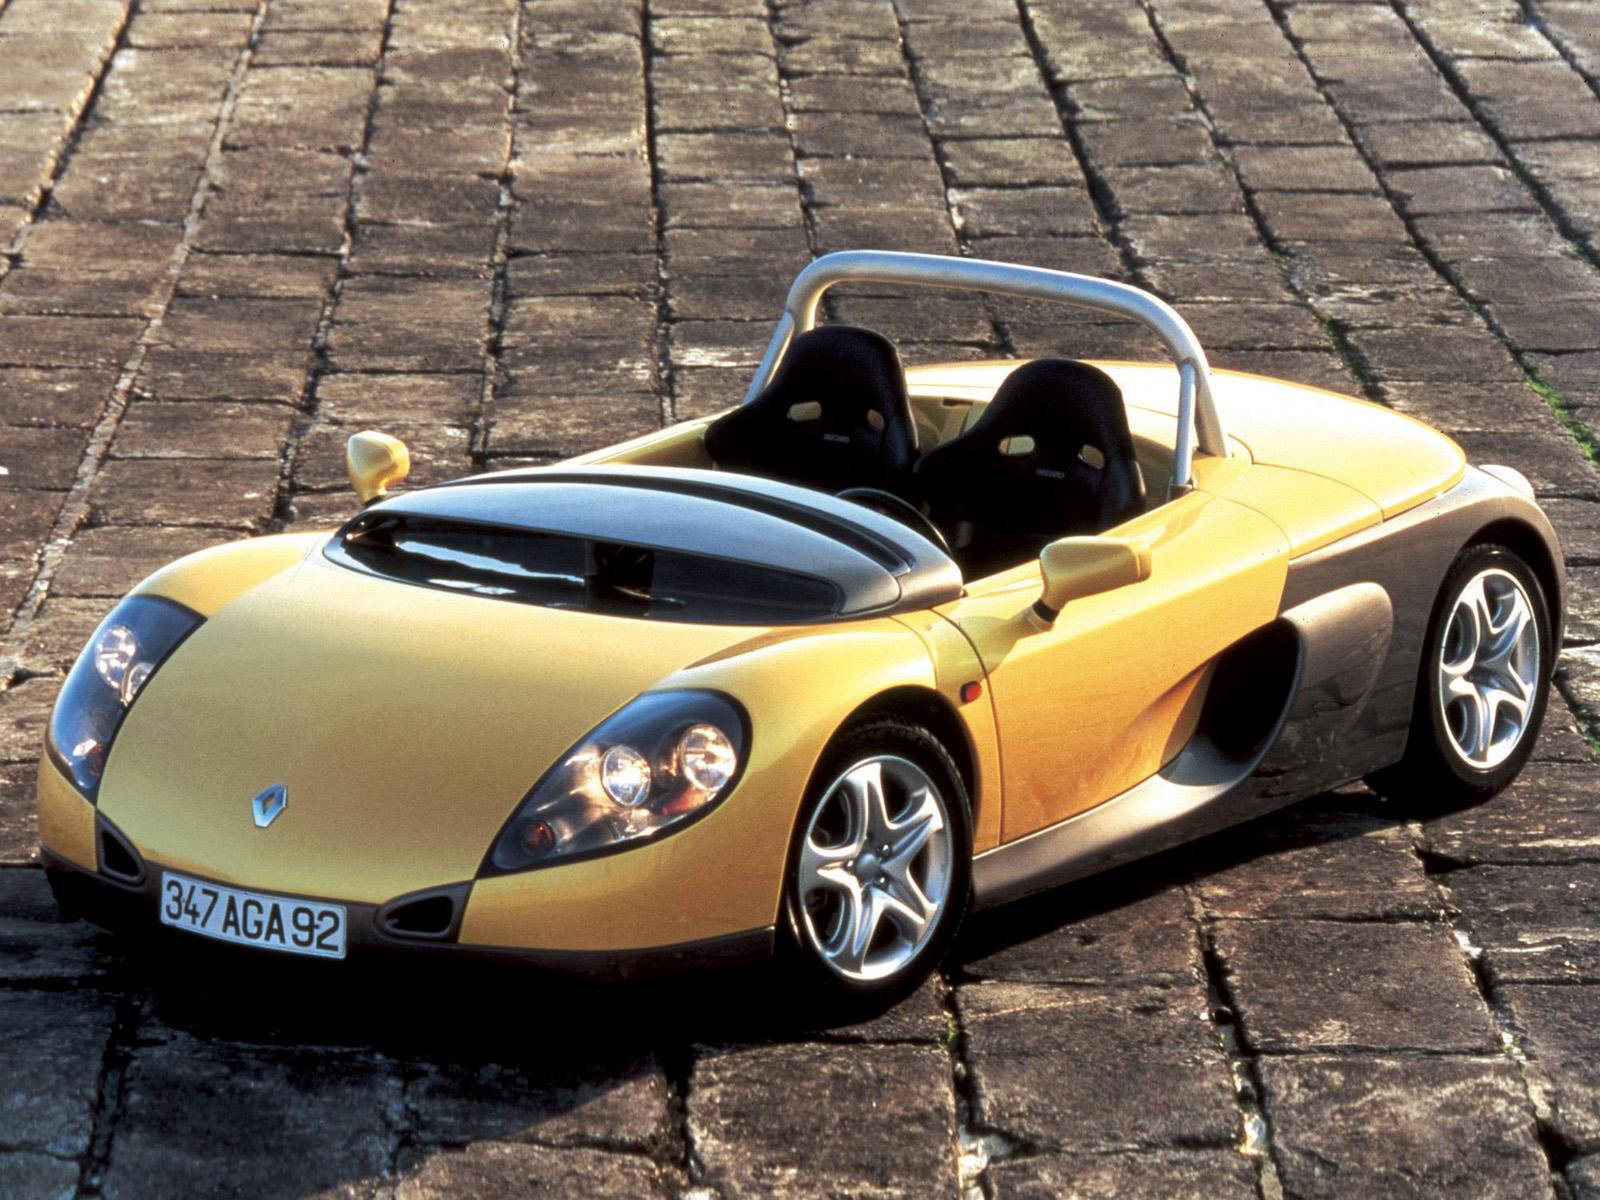 1995 Renault Sport Spider g wallpaper | 1600x1200 | 155980 | WallpaperUP